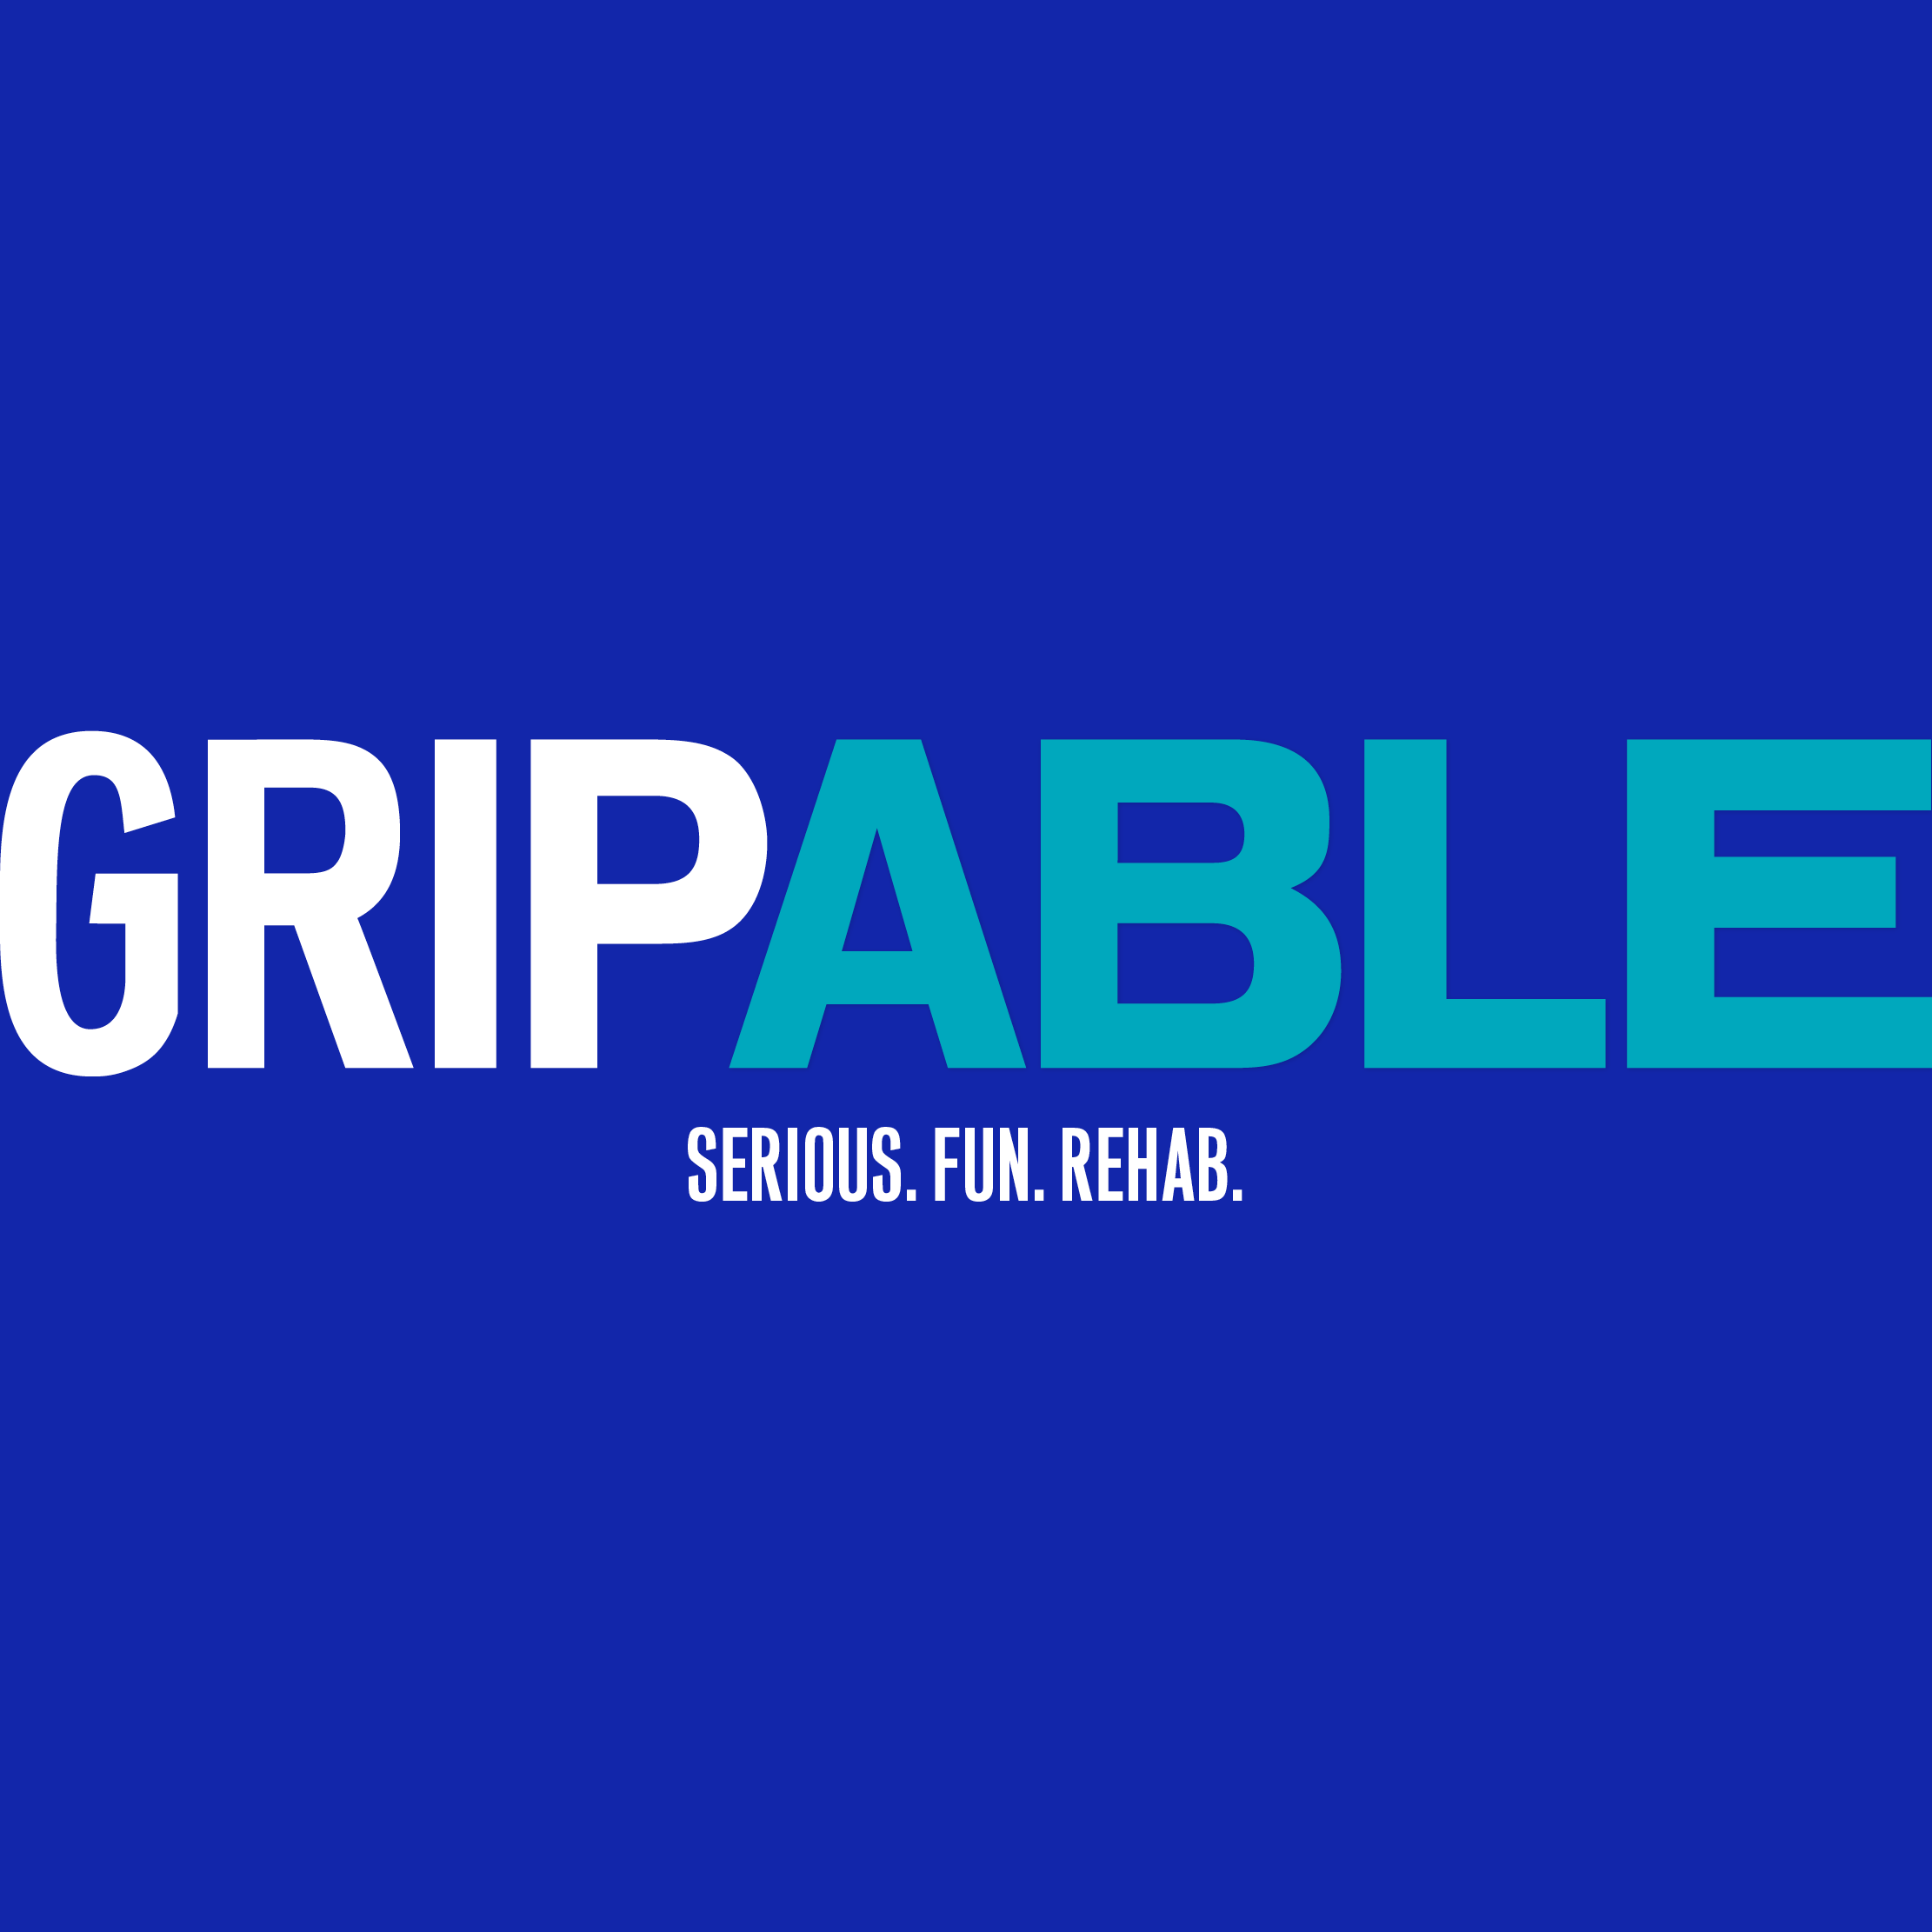 Gripable